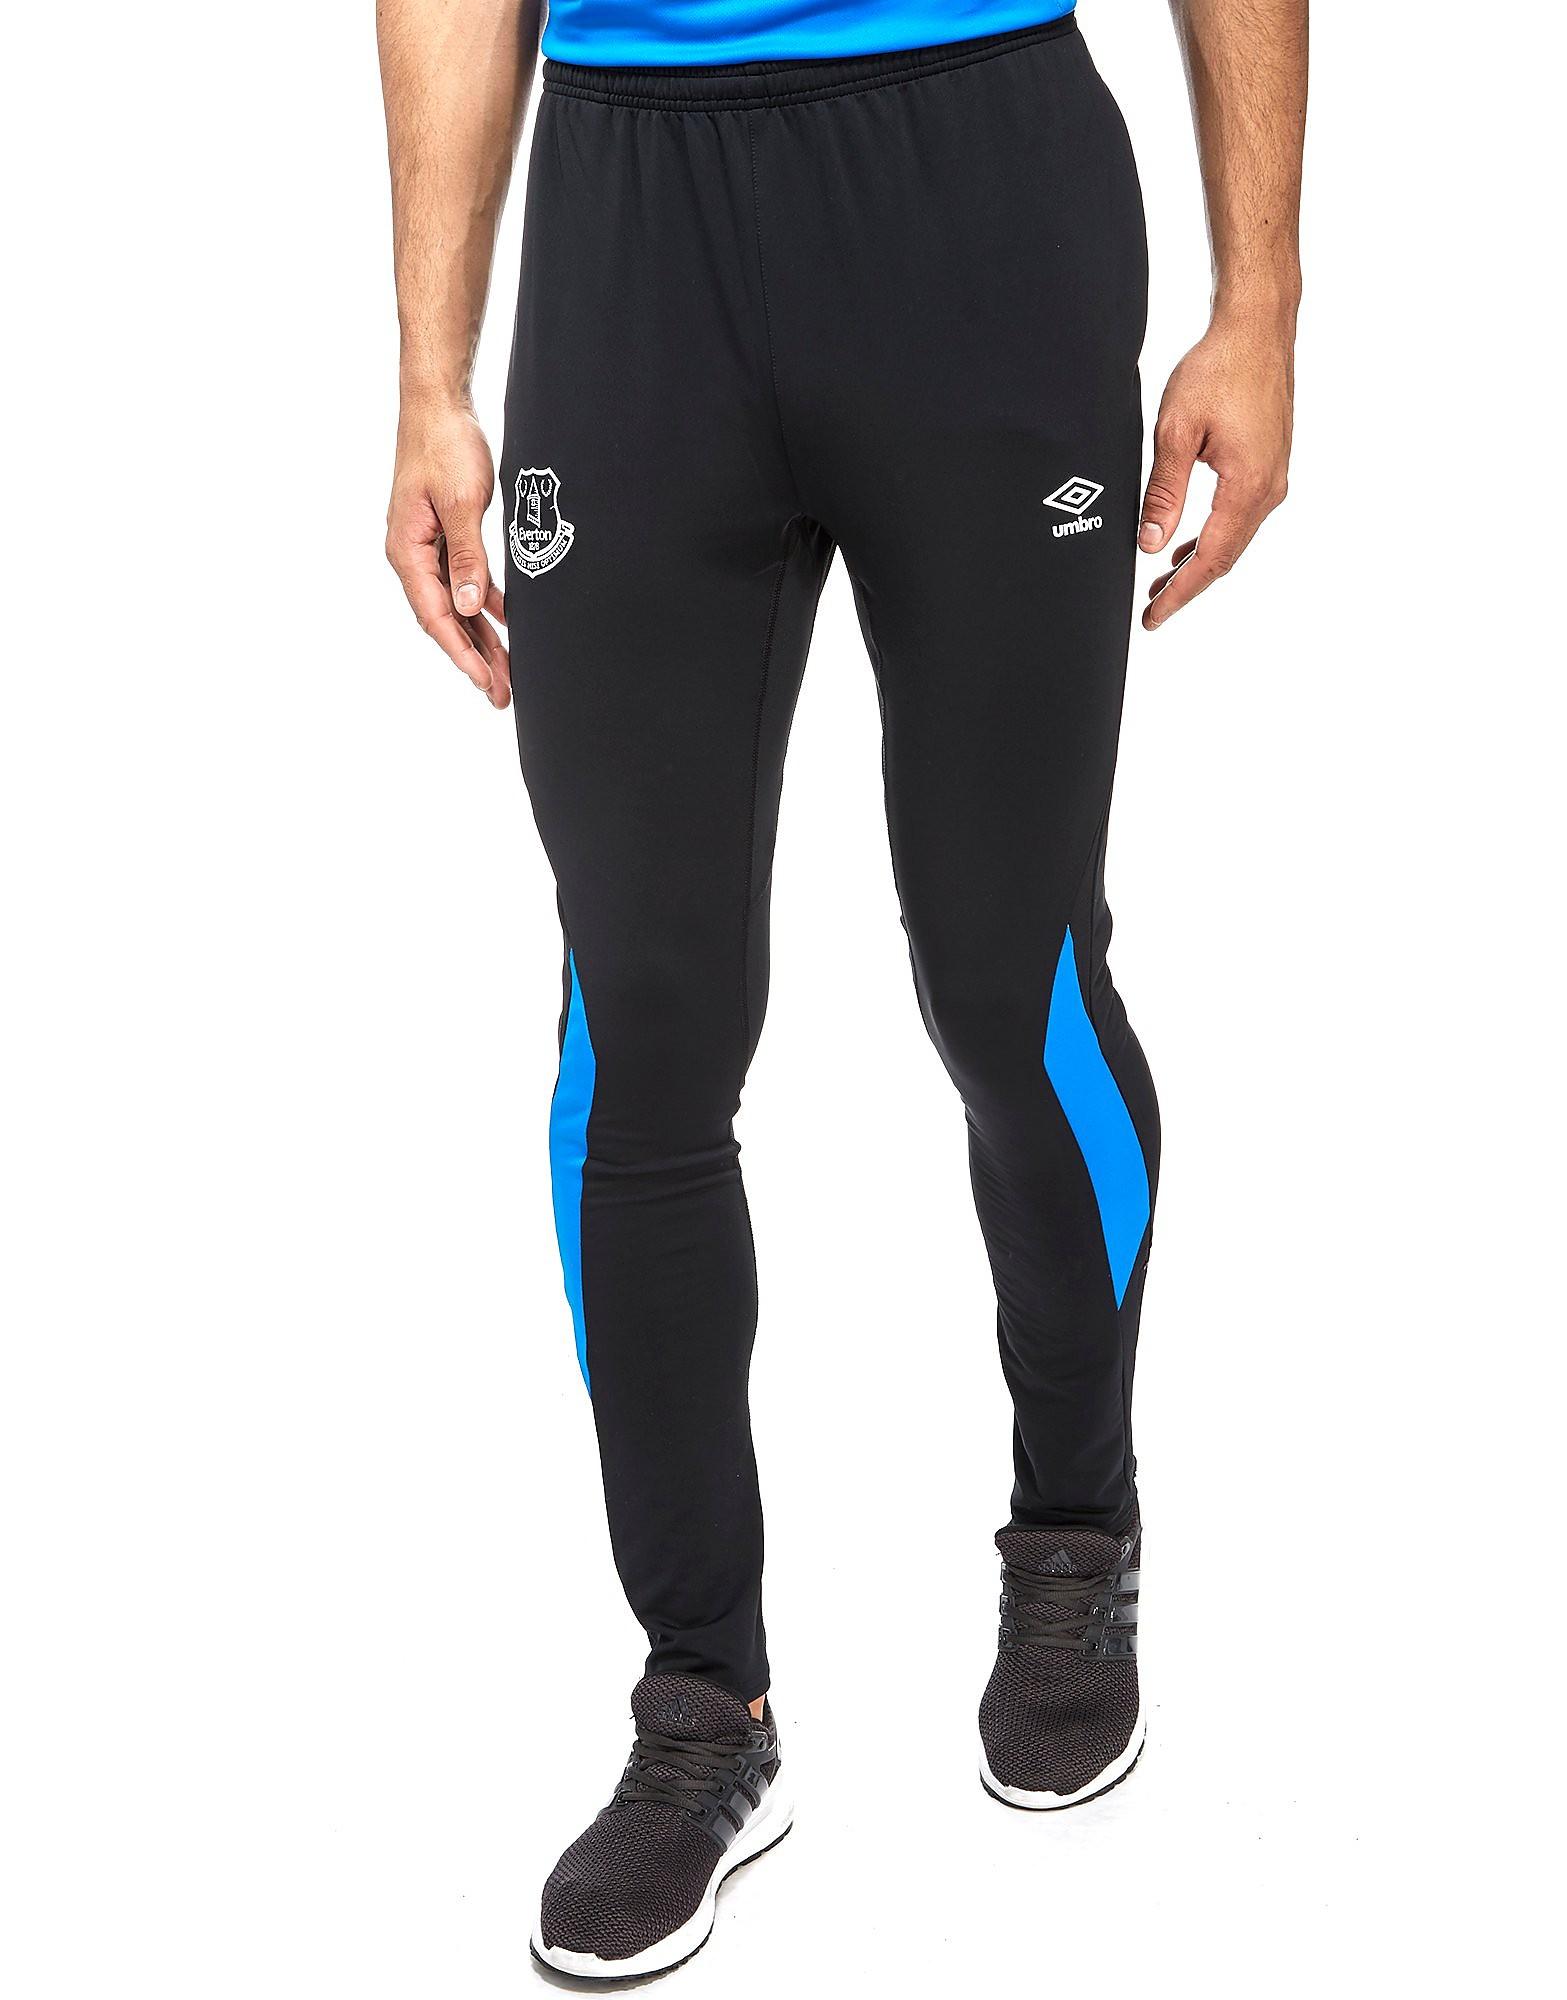 Umbro pantalón de entrenamiento Everton FC